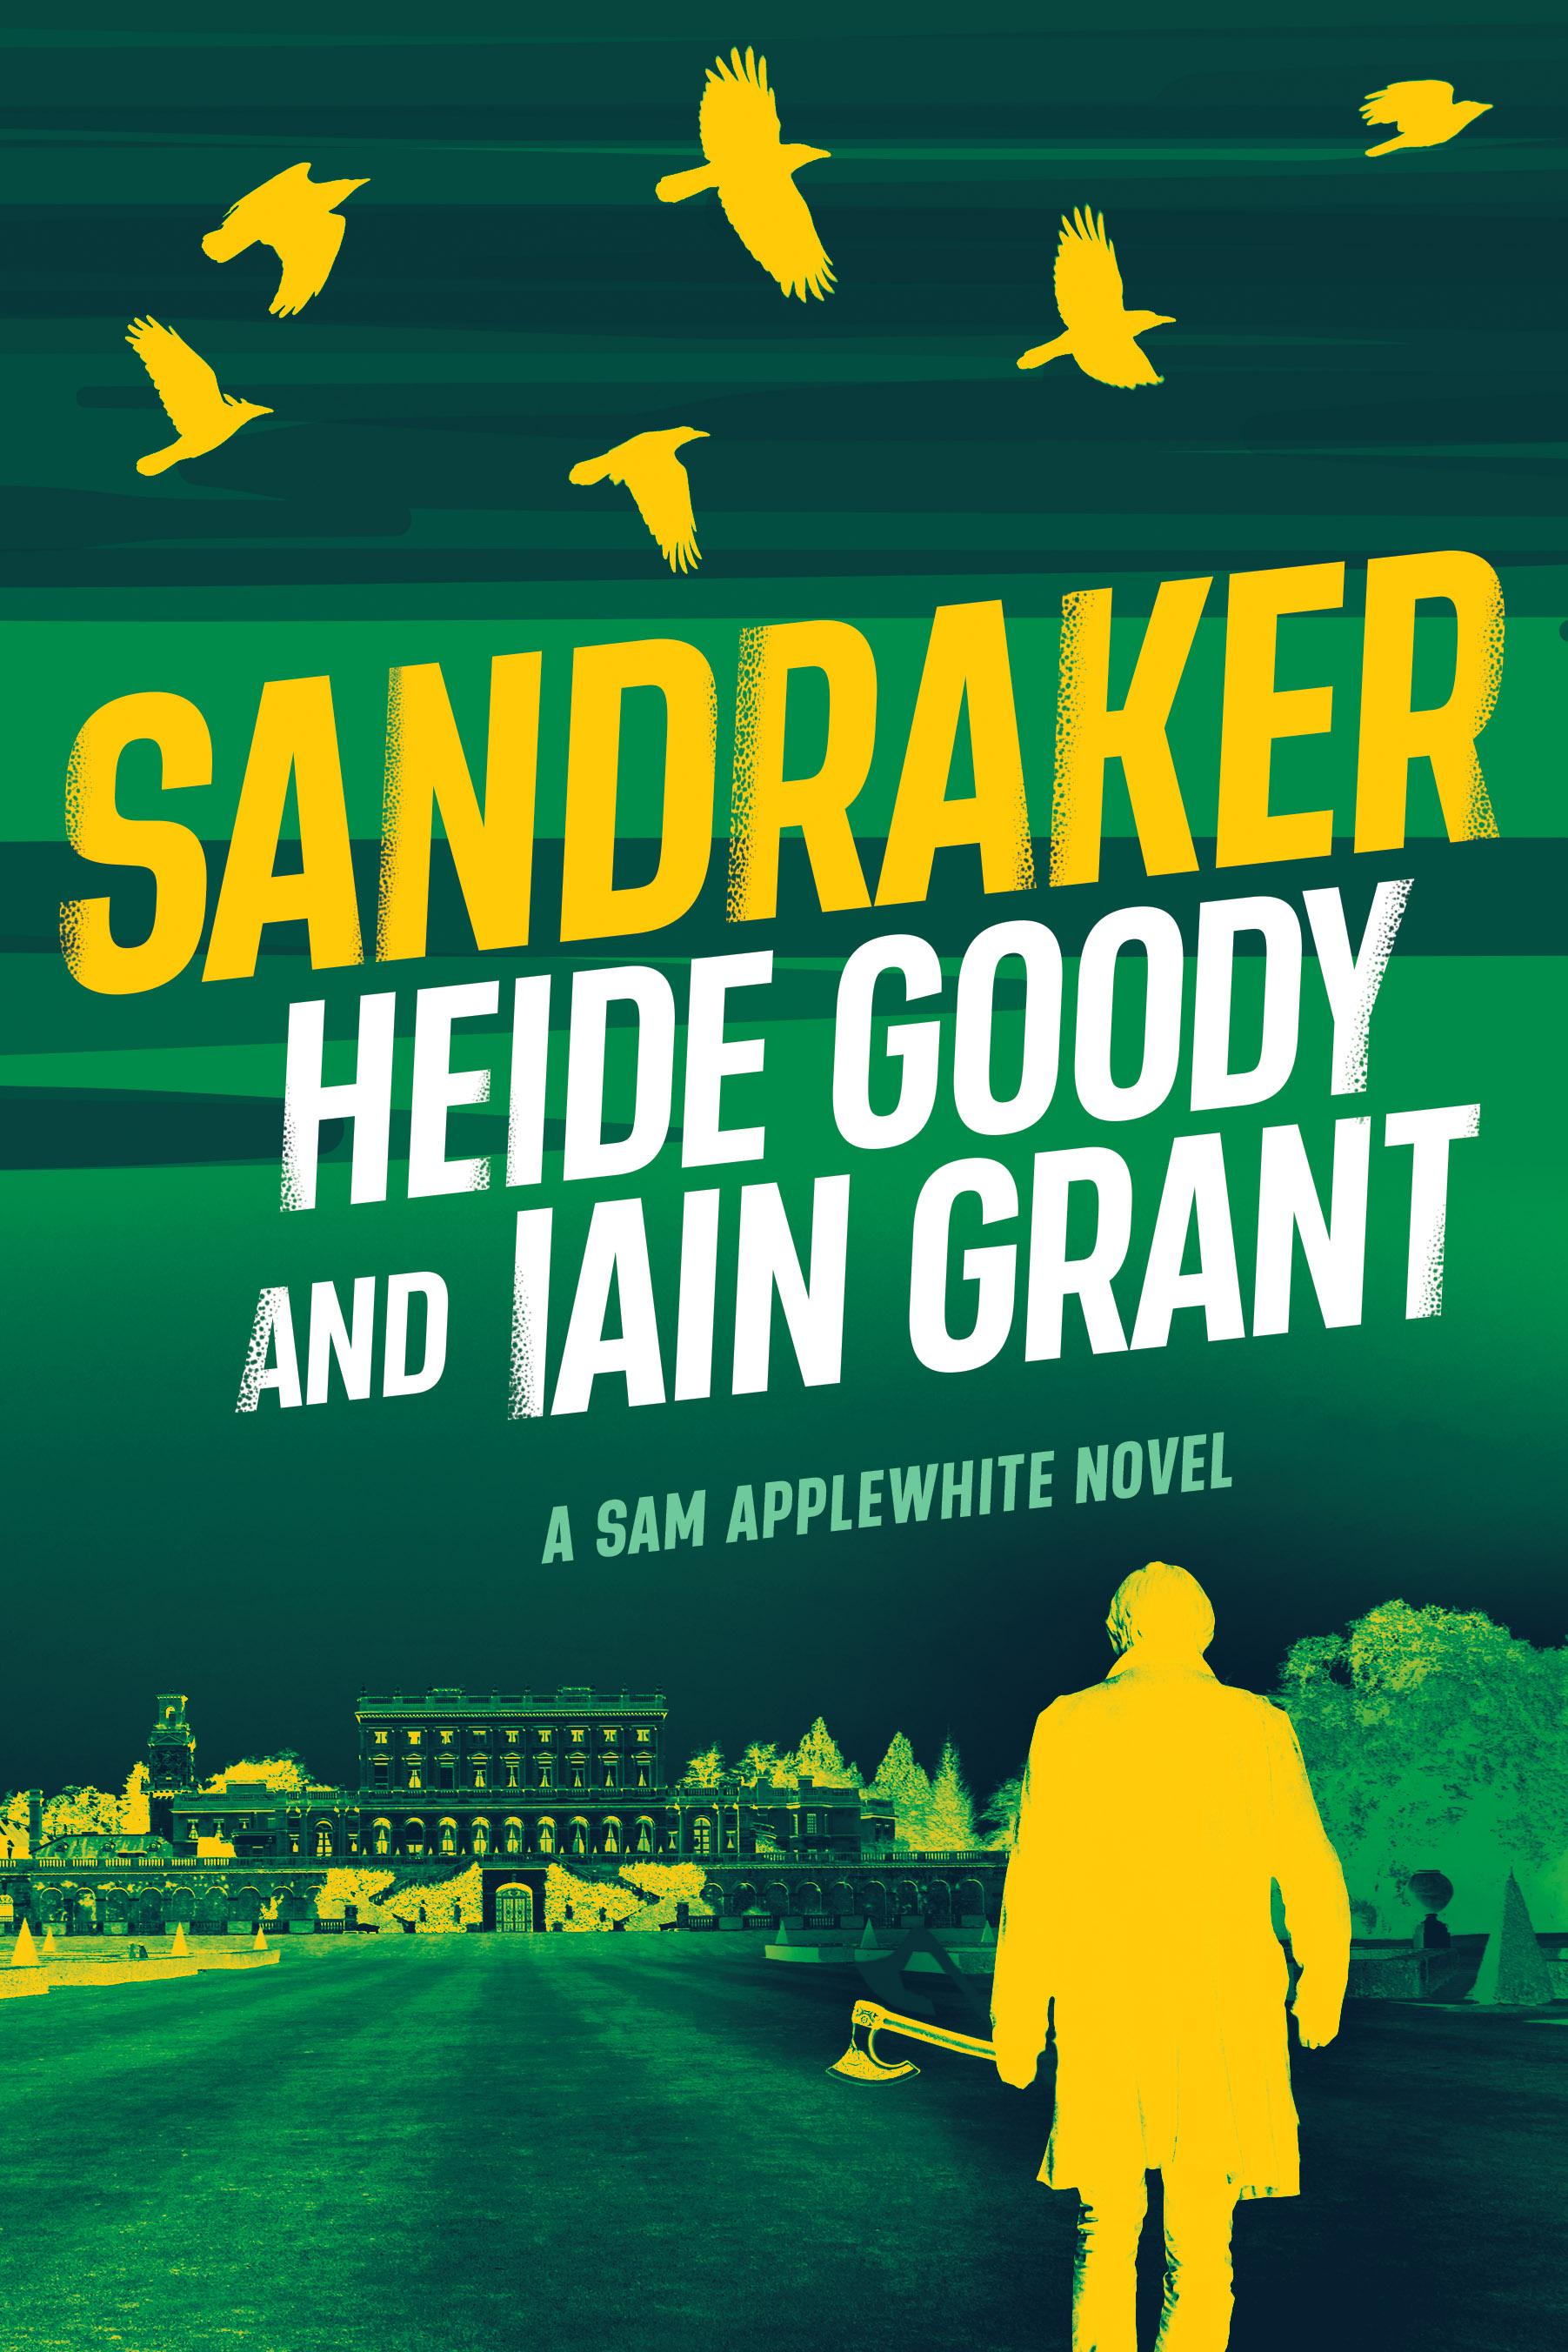 GoodyGrant_Sandraker_Ebook